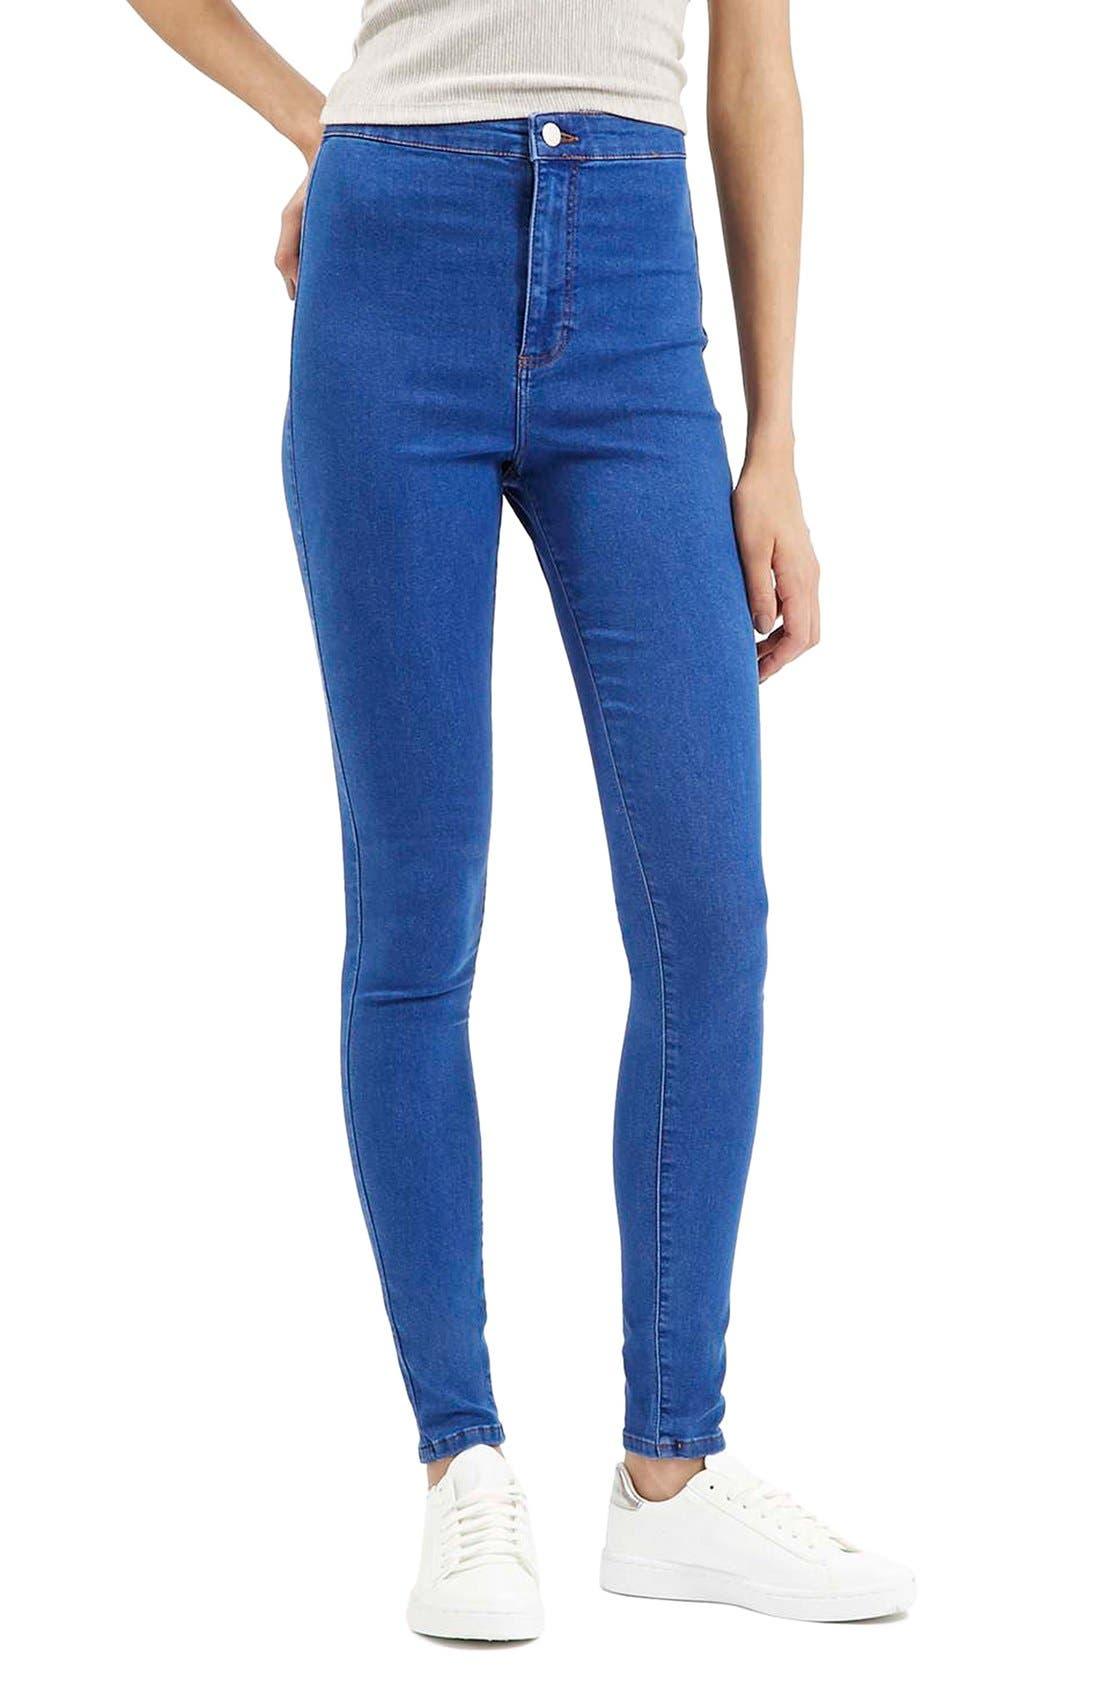 Main Image - Topshop'Joni' High Rise Skinny Jeans (Bright Blue)